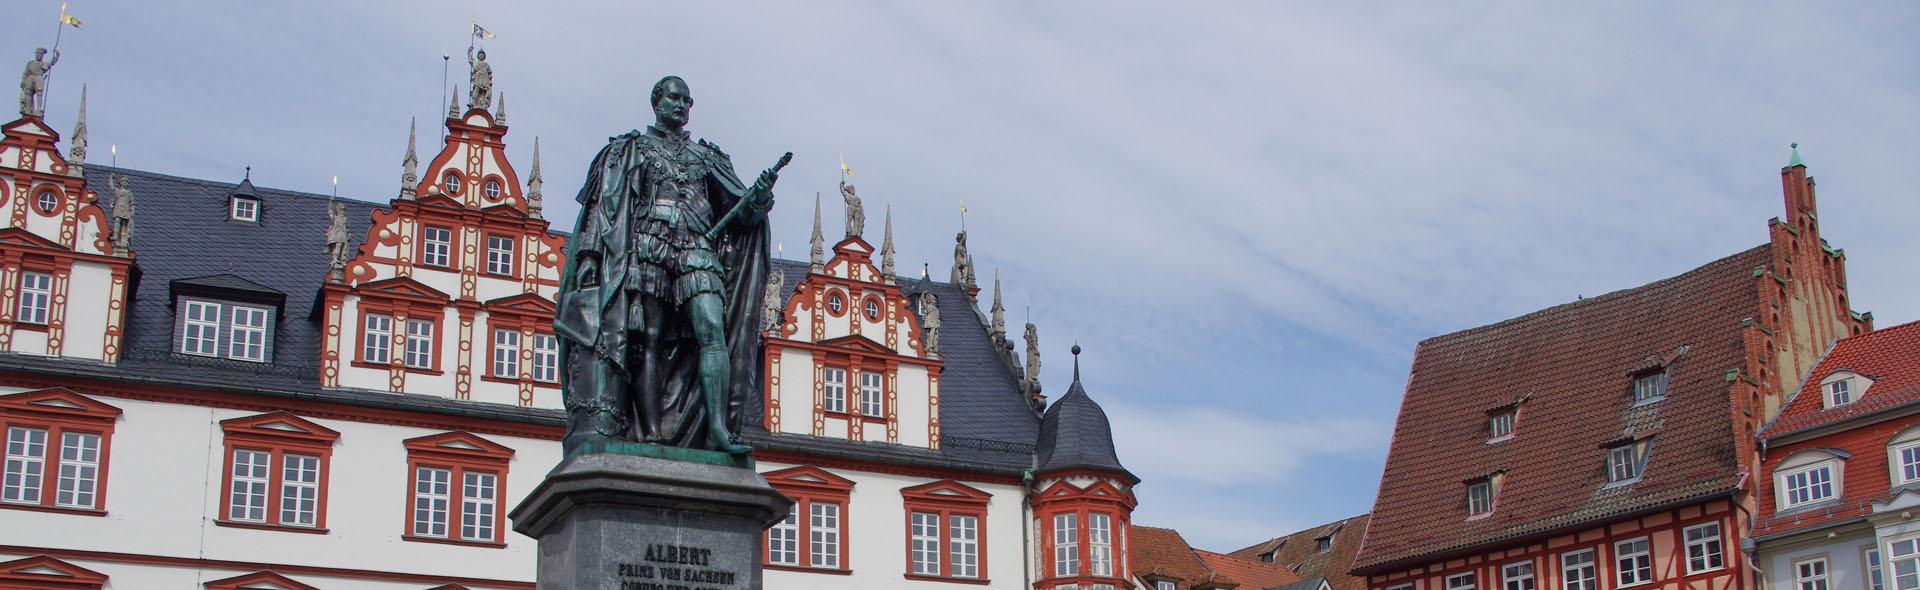 Coburg, Krone Frankens